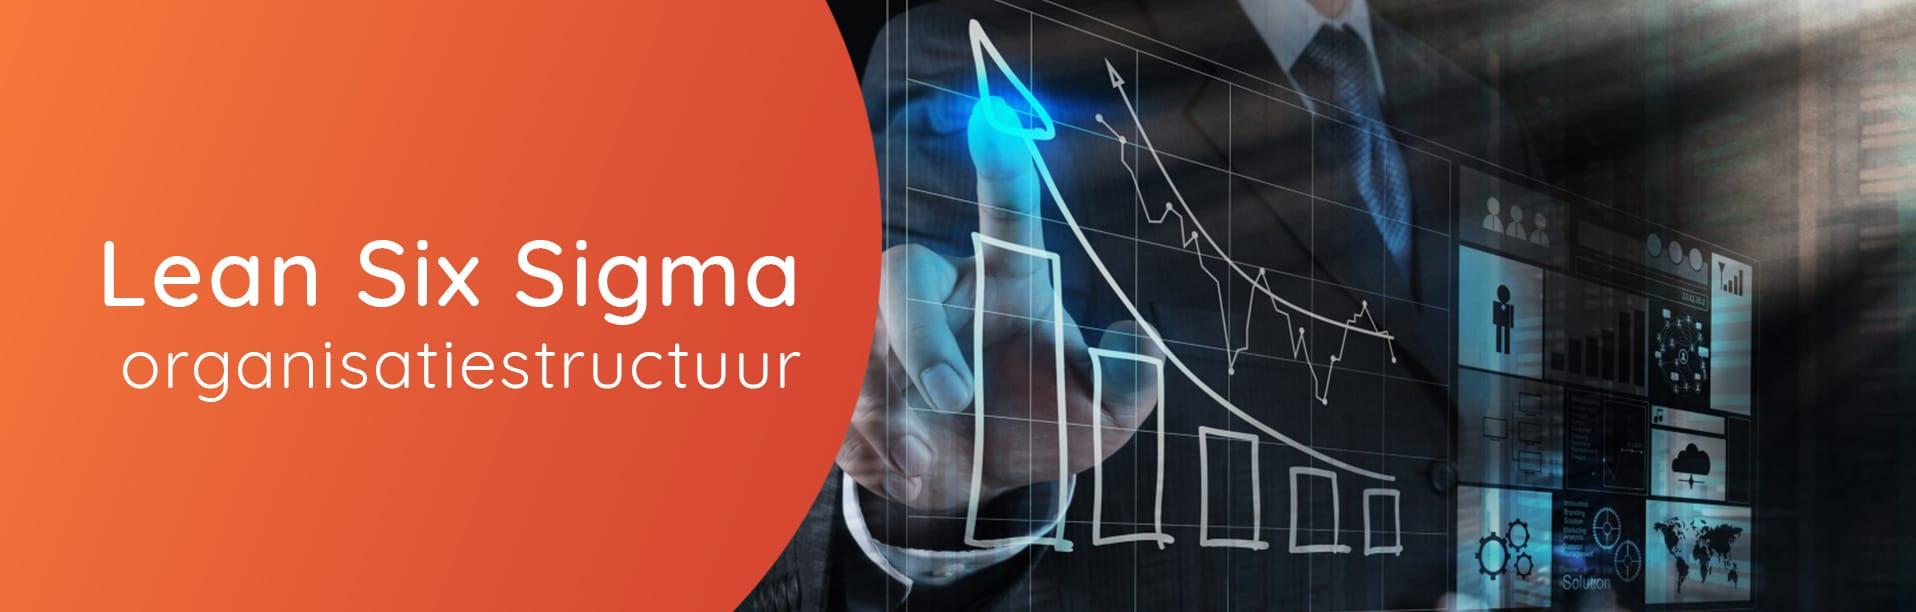 lean six sigma organisatiestructuur